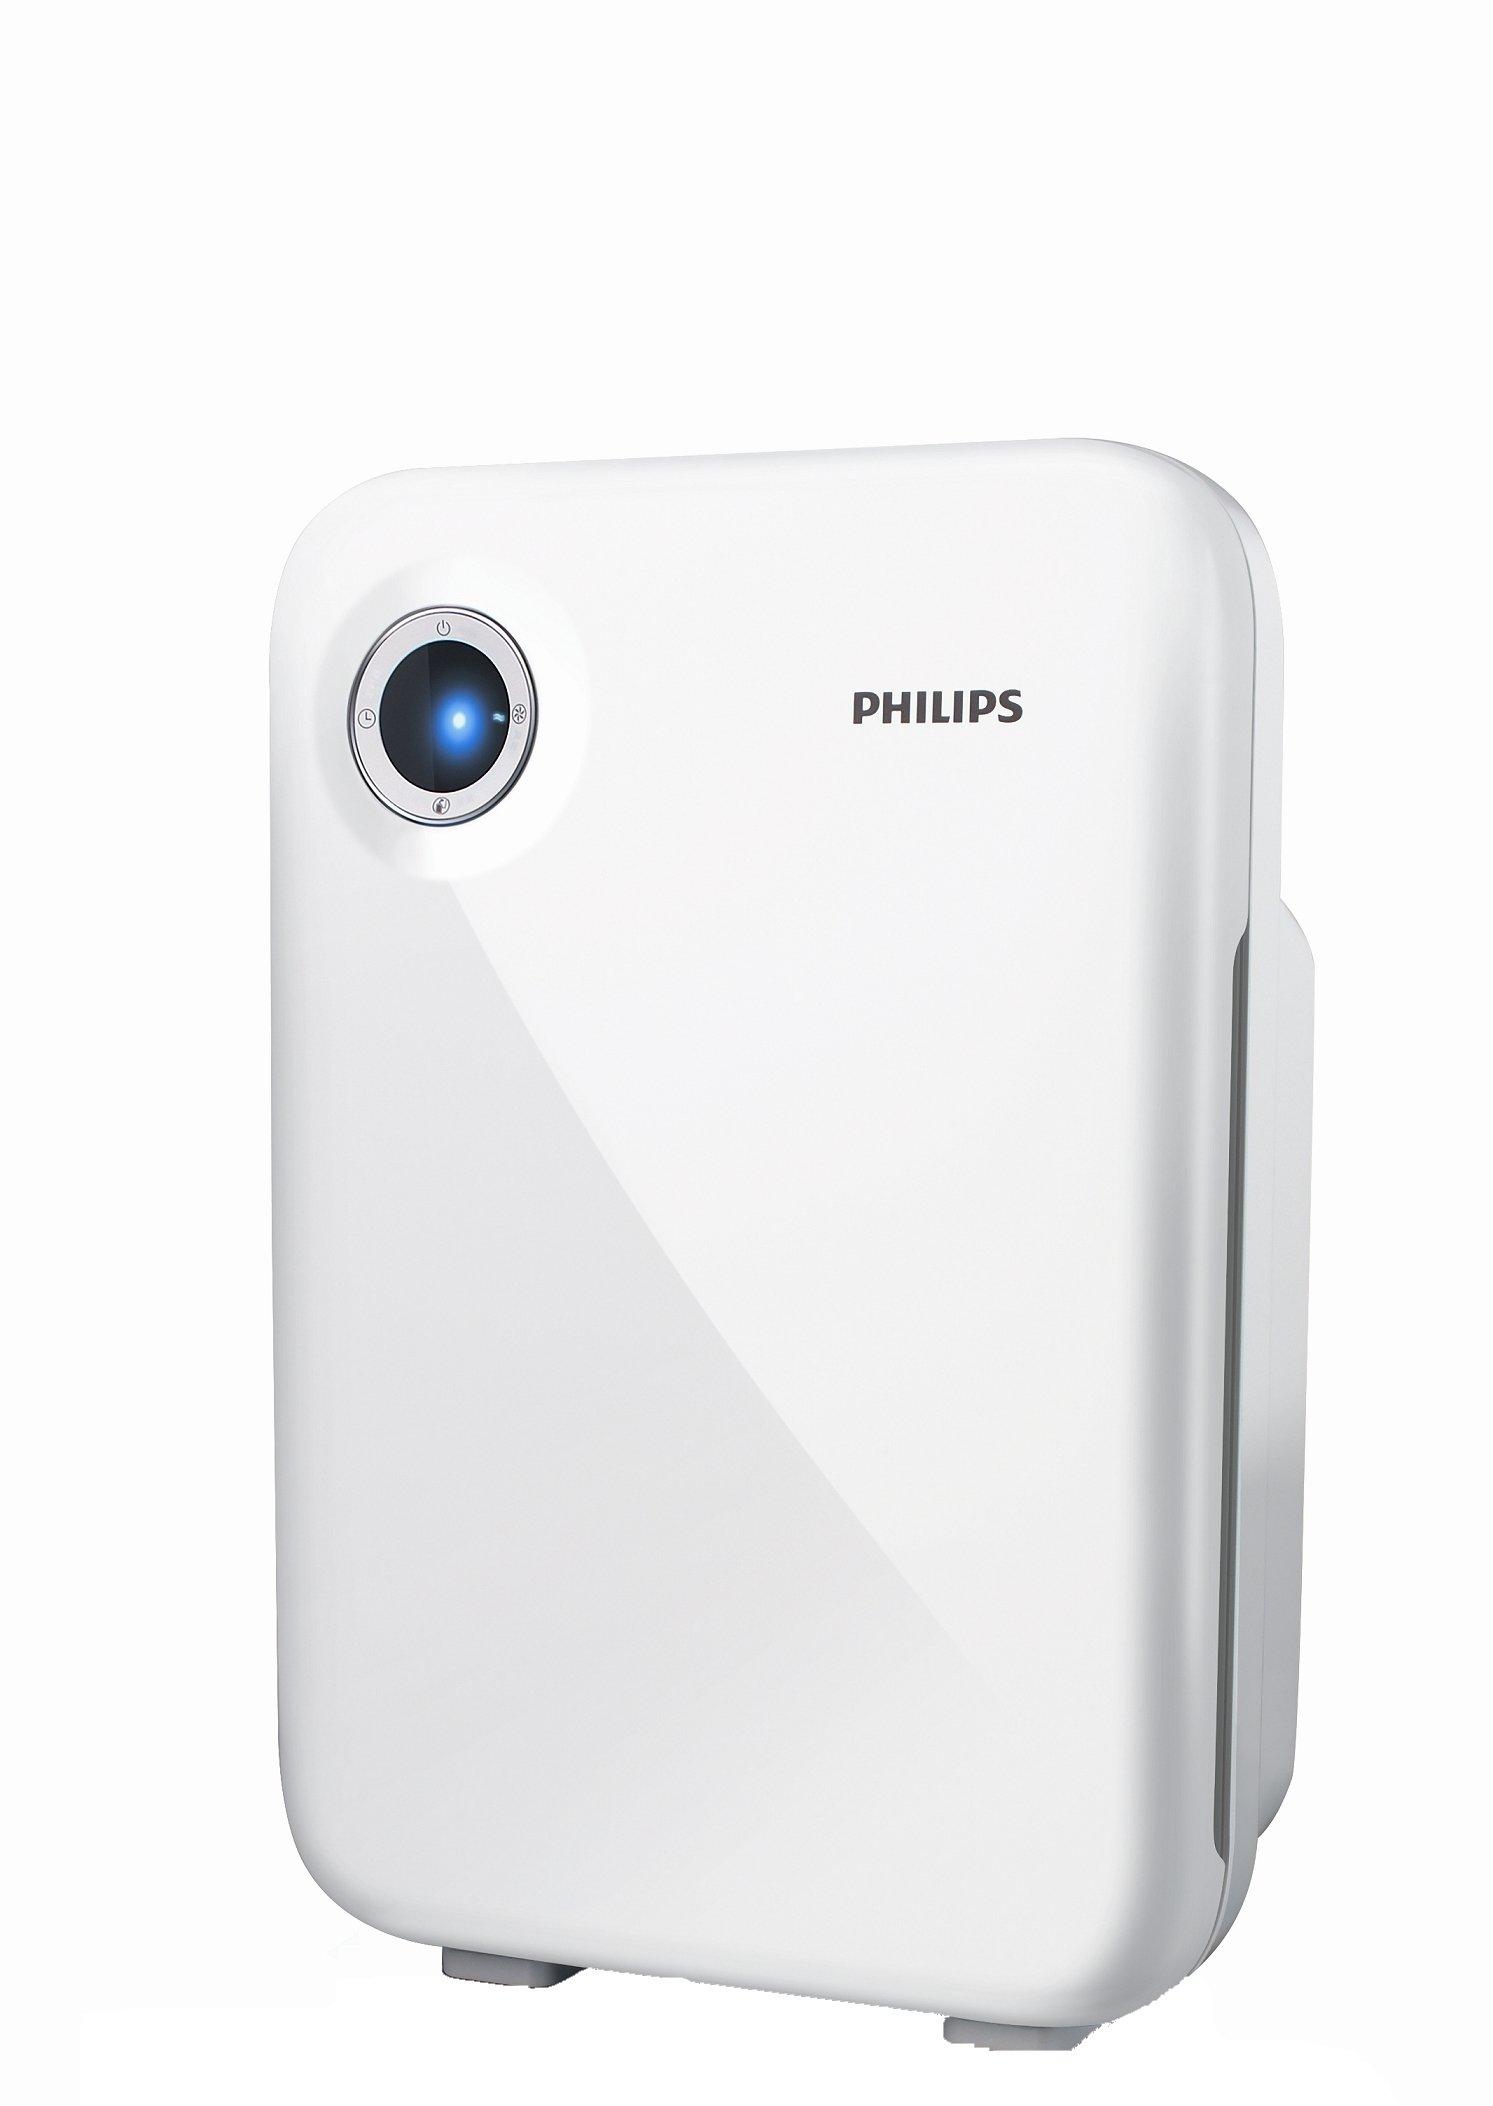 Philips Purificador de Aire AC4012/10, 30 W, Acrilonitrilo butadieno estireno (ABS